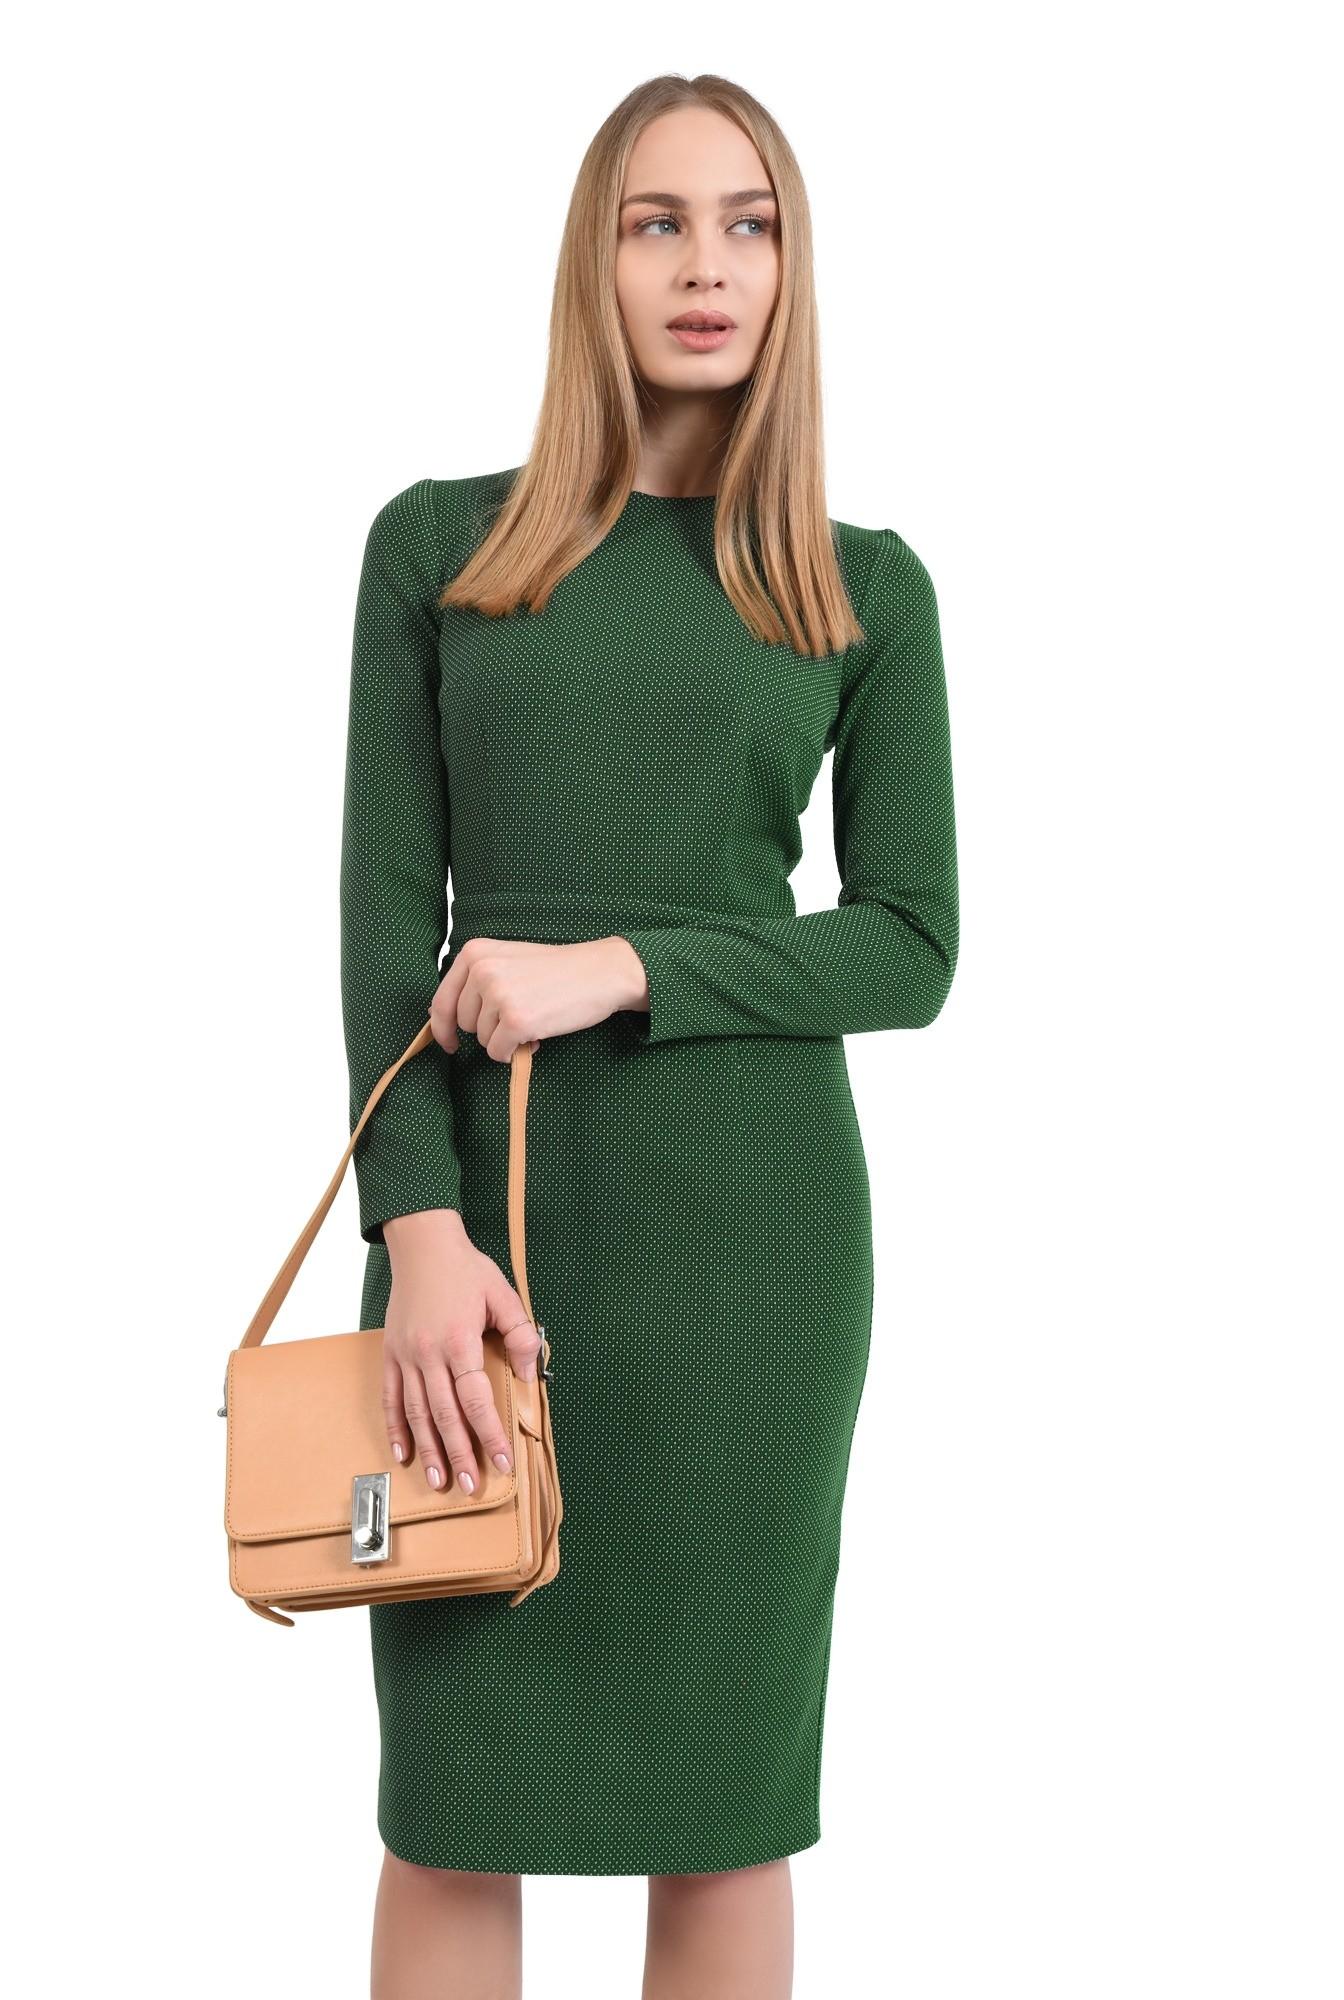 rochie verde, creion, conica, midi, decolteu la baza gatului